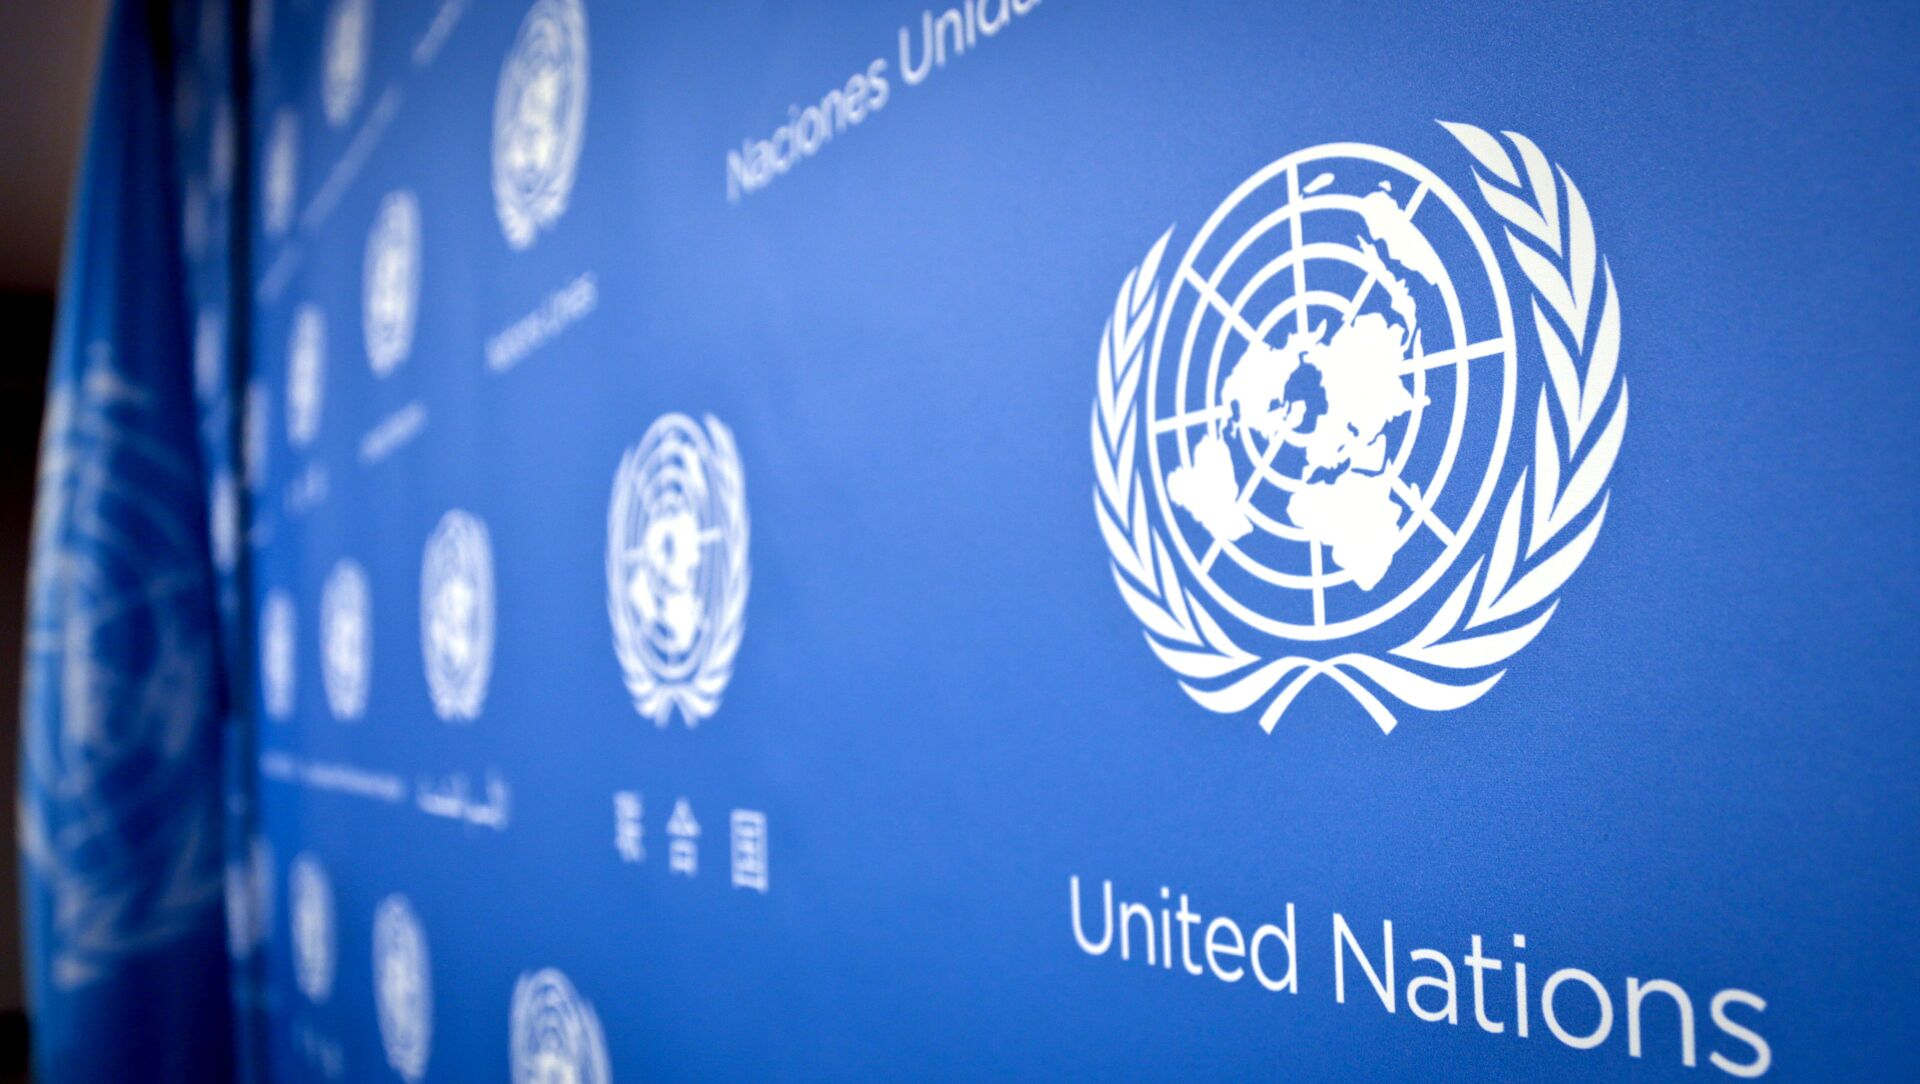 Logo de la ONU - Sputnik Mundo, 1920, 05.02.2021